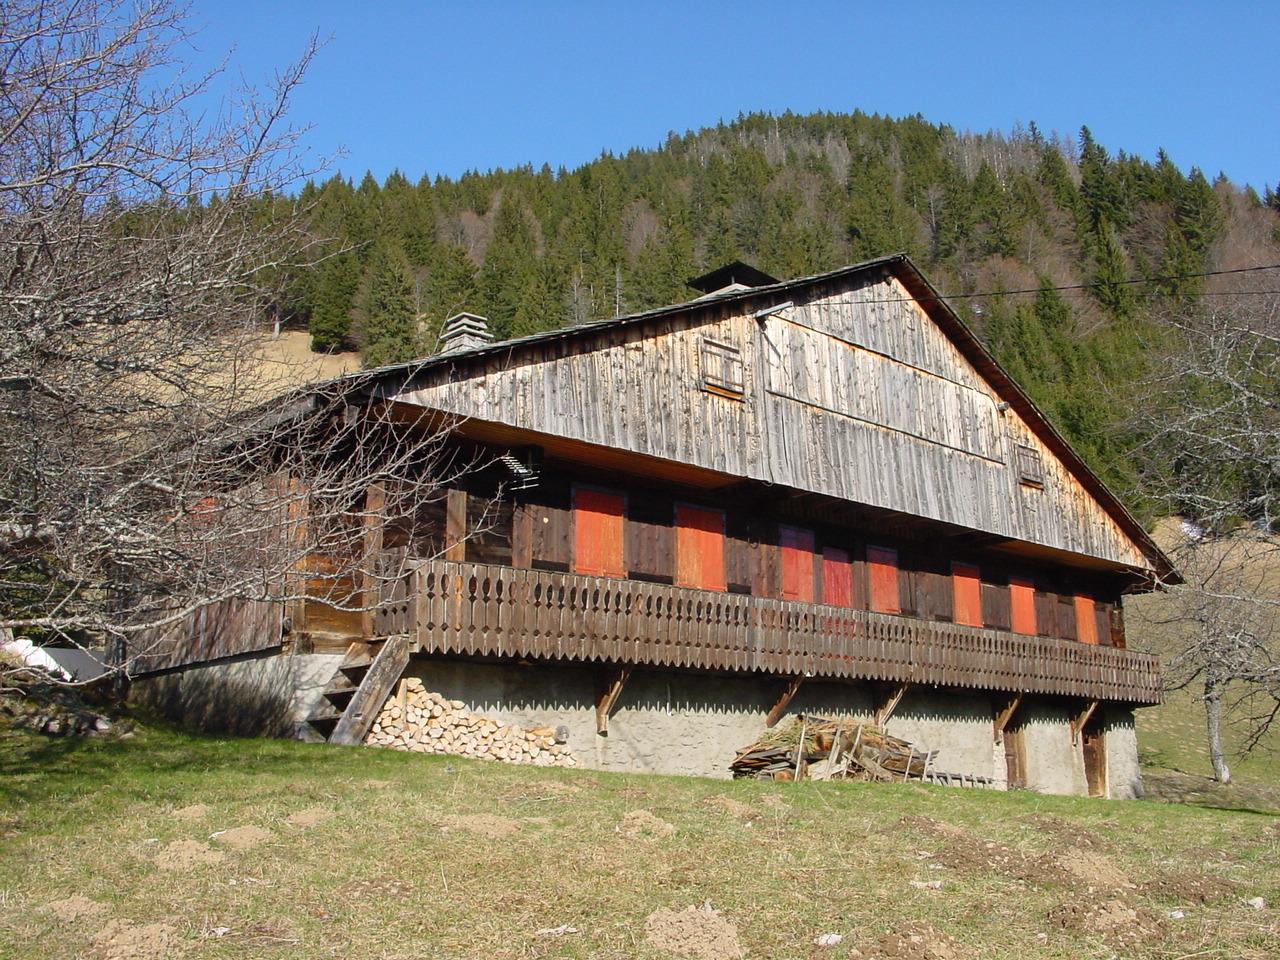 Archivo chalet vall e d 39 abondance france jpg wikipedia la enciclopedia libre - The dancing chalet ...